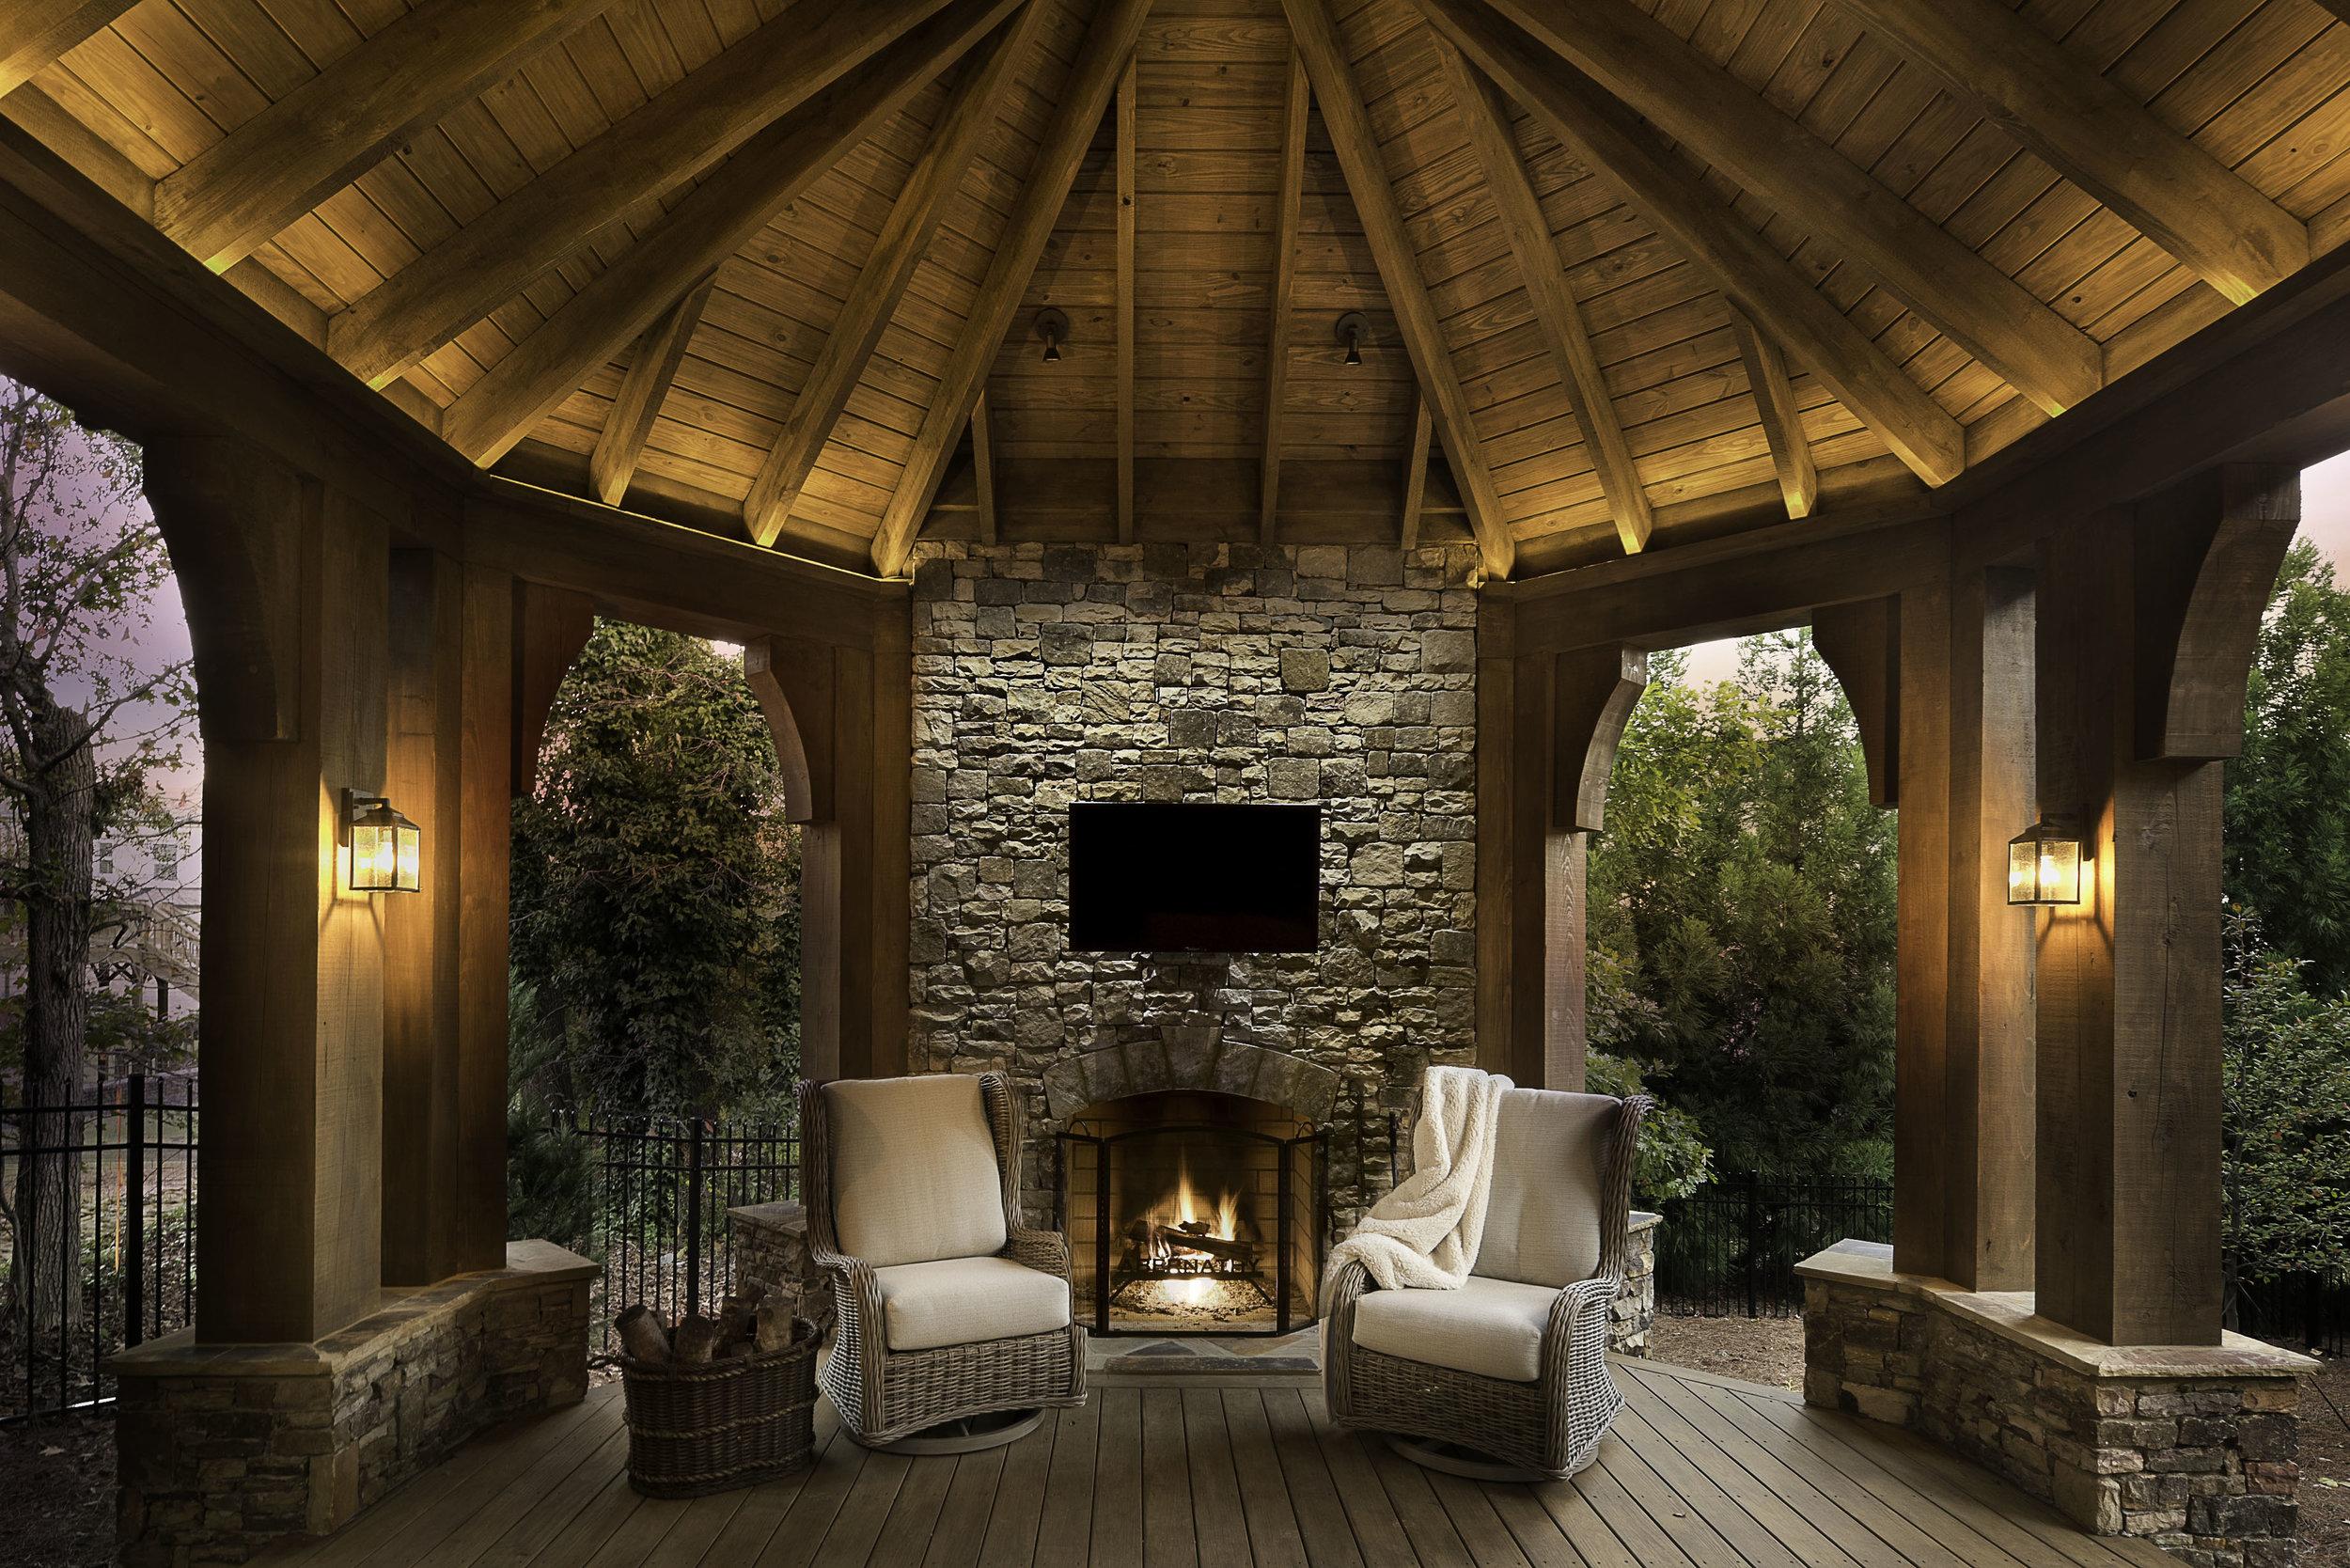 Darien Millworks & Timber Reclaimed Cypress Beams